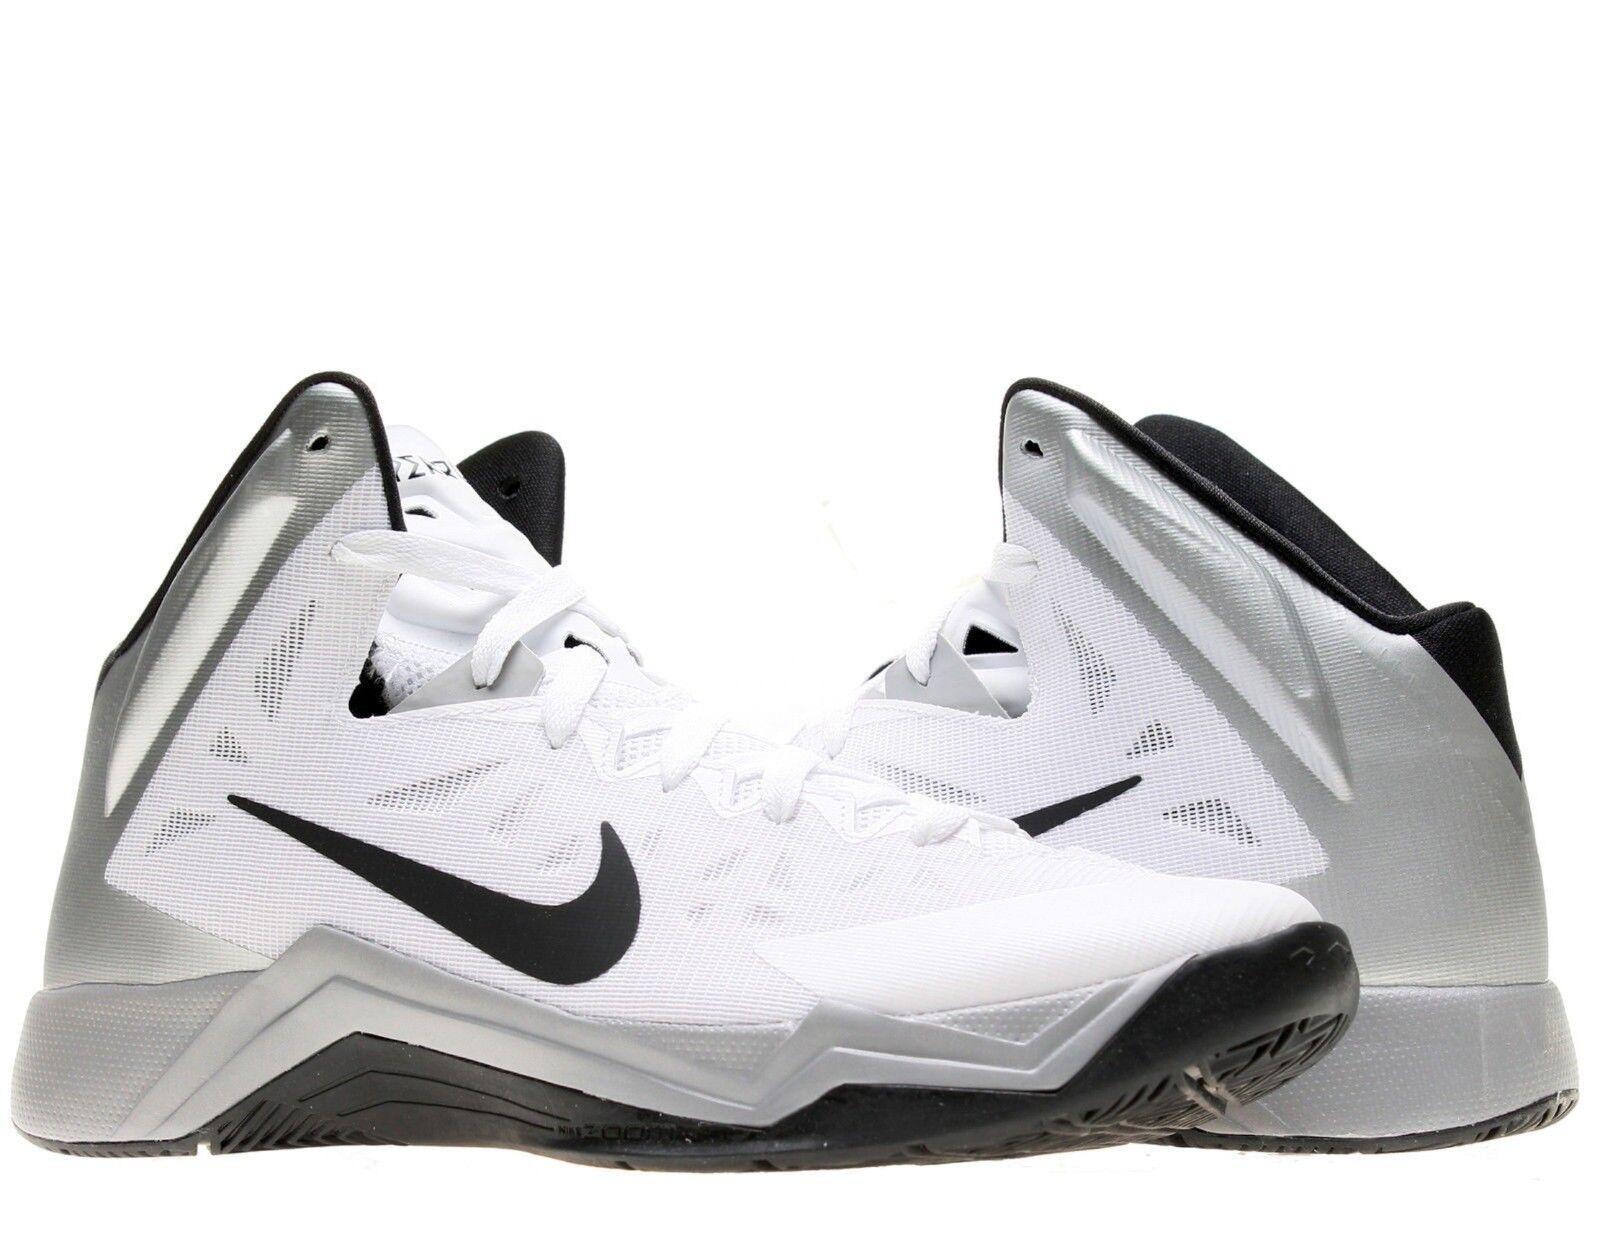 Gli basket uomini sono nike zoom hyperquickness tbc, scarpe da basket Gli 599420 100 bianco grigio sz 13,5 788be9